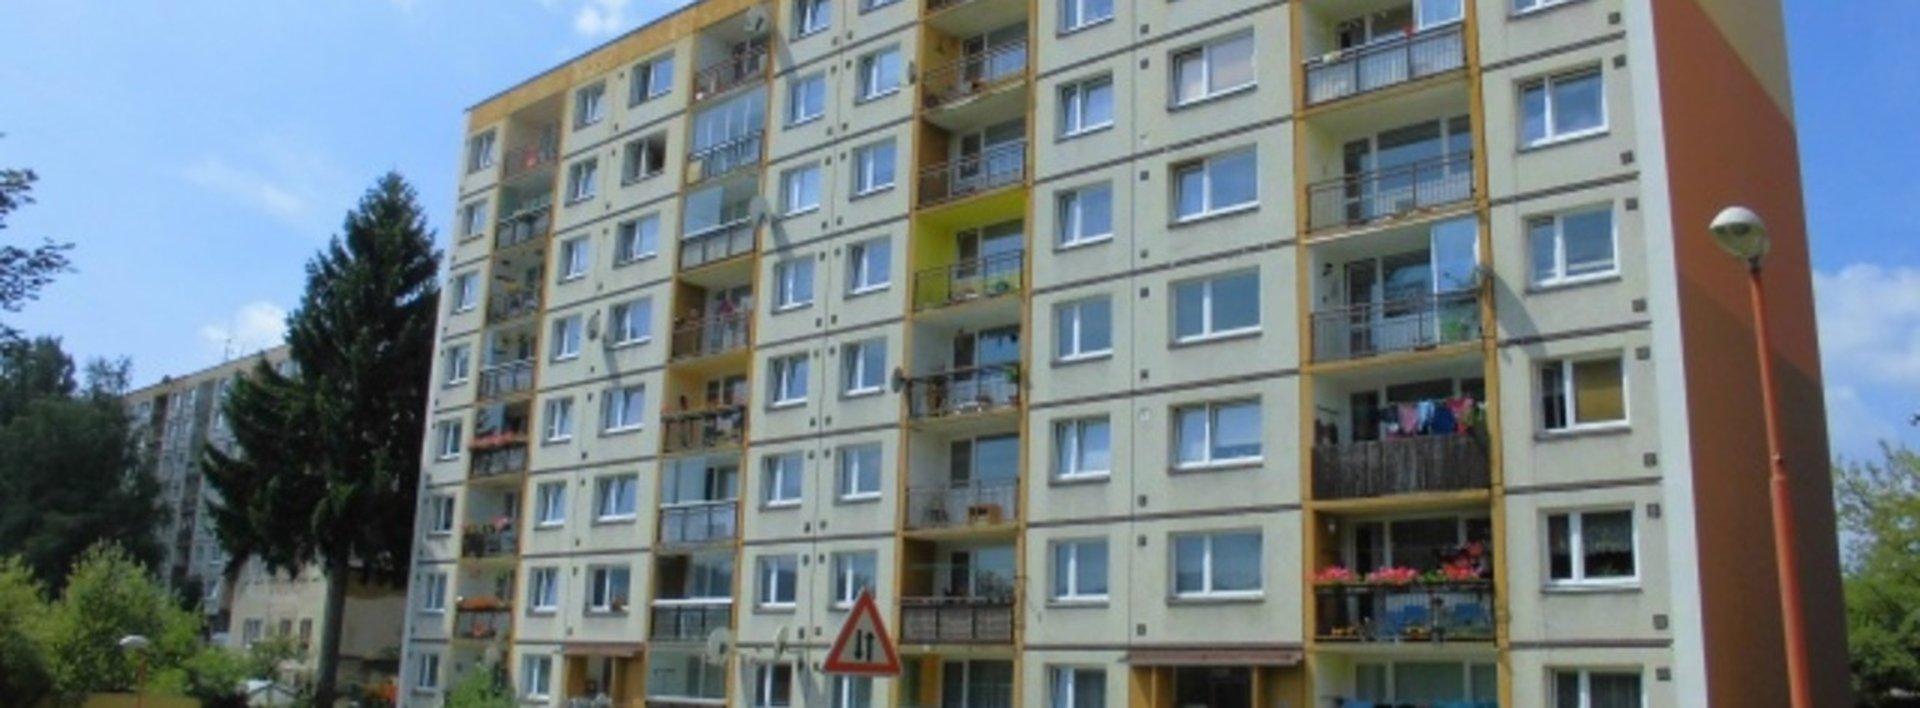 Prostorný, slunný byt 4+1+L, 93m2, v klidné části JBC, Ev.č.: N46395